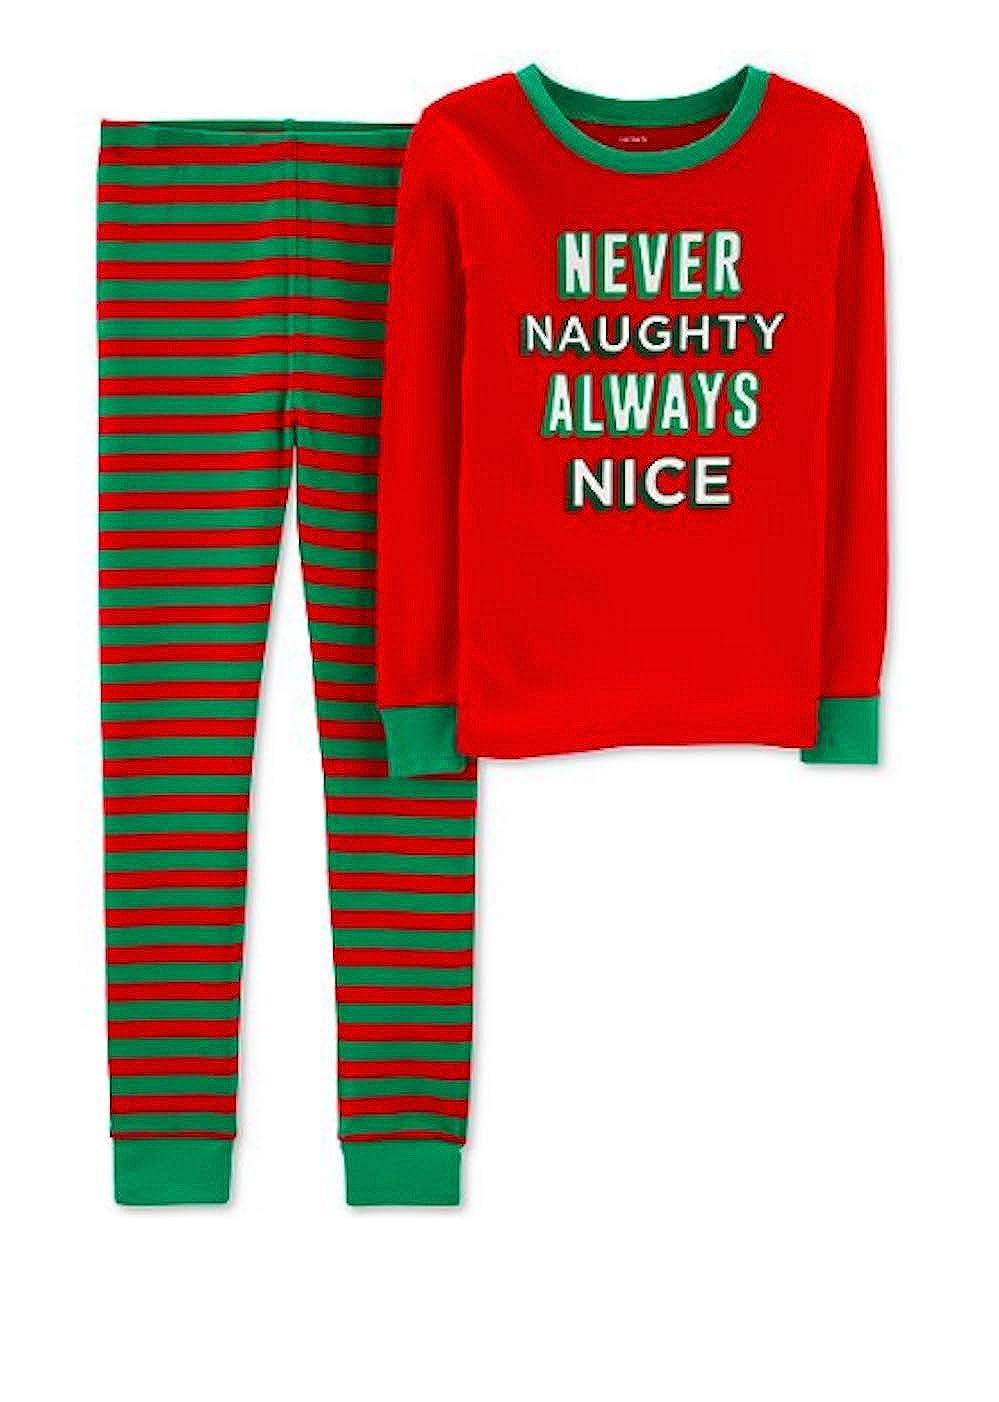 Never Naughty Always Nice Carters 2-Piece Boys Christmas Snug Fit Cotton PJs